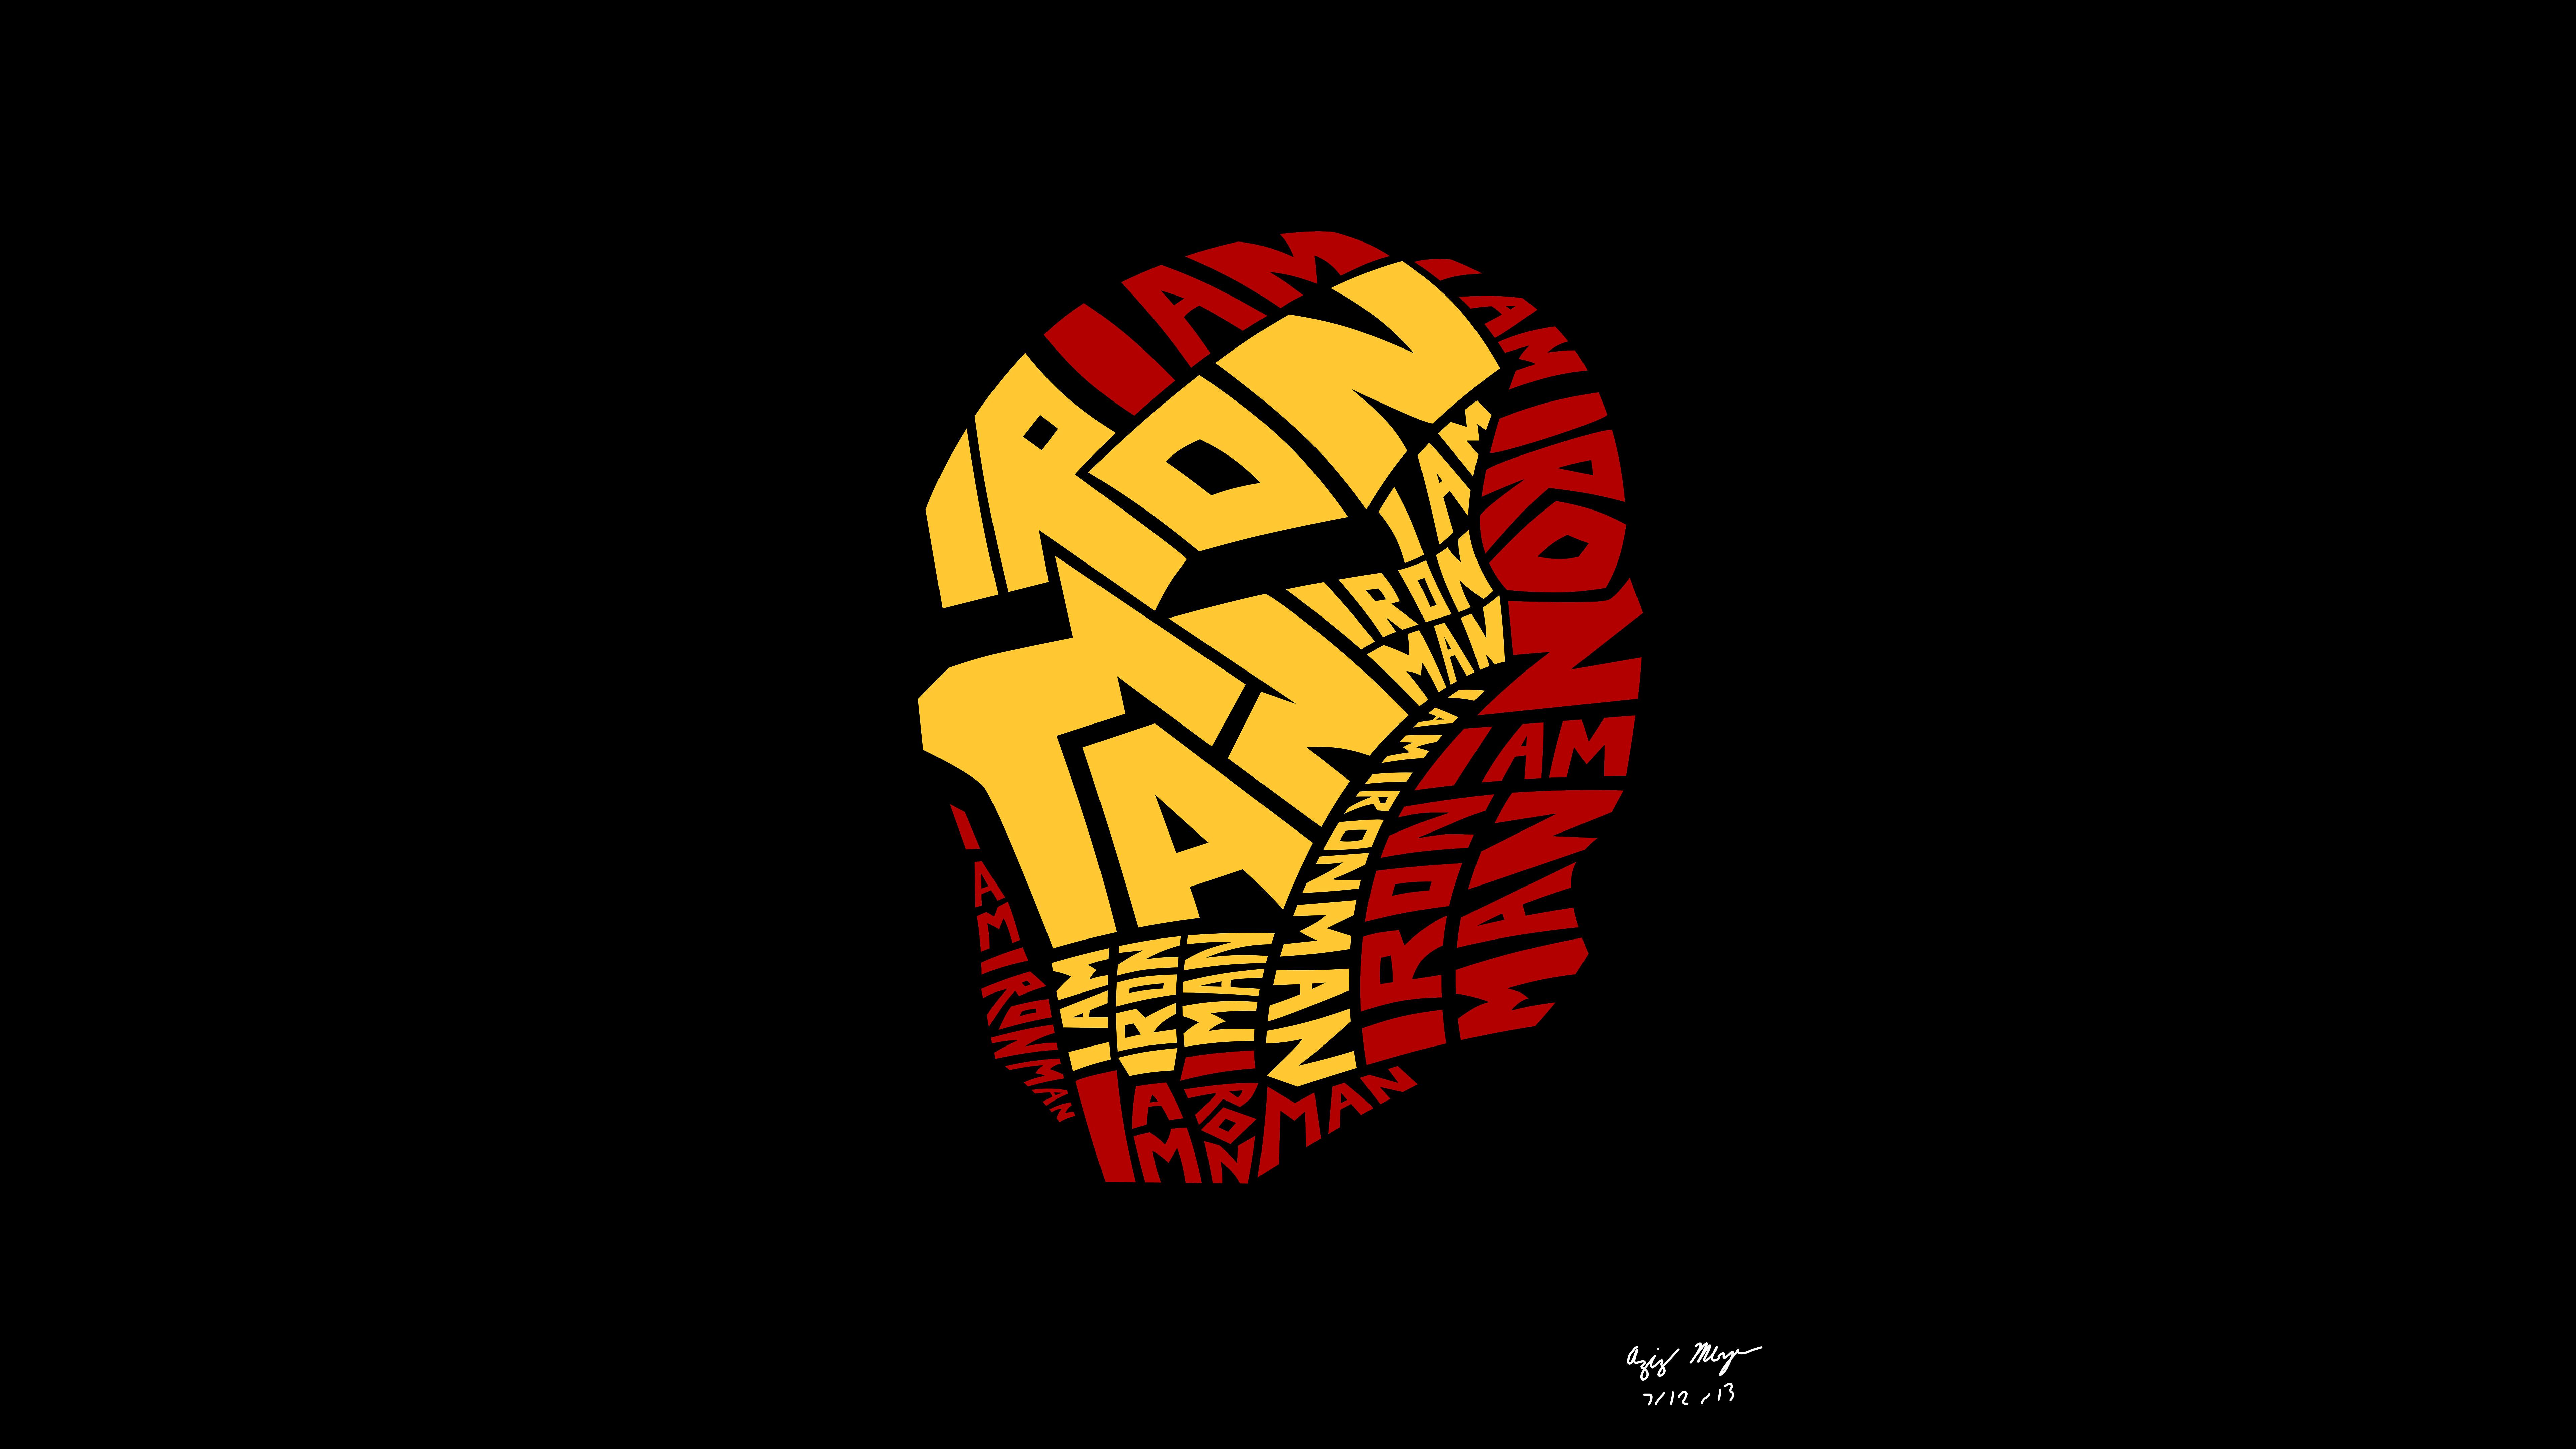 7680x4320 Iron Man Typography Artwork 8k 8k Hd 4k Wallpapers Images